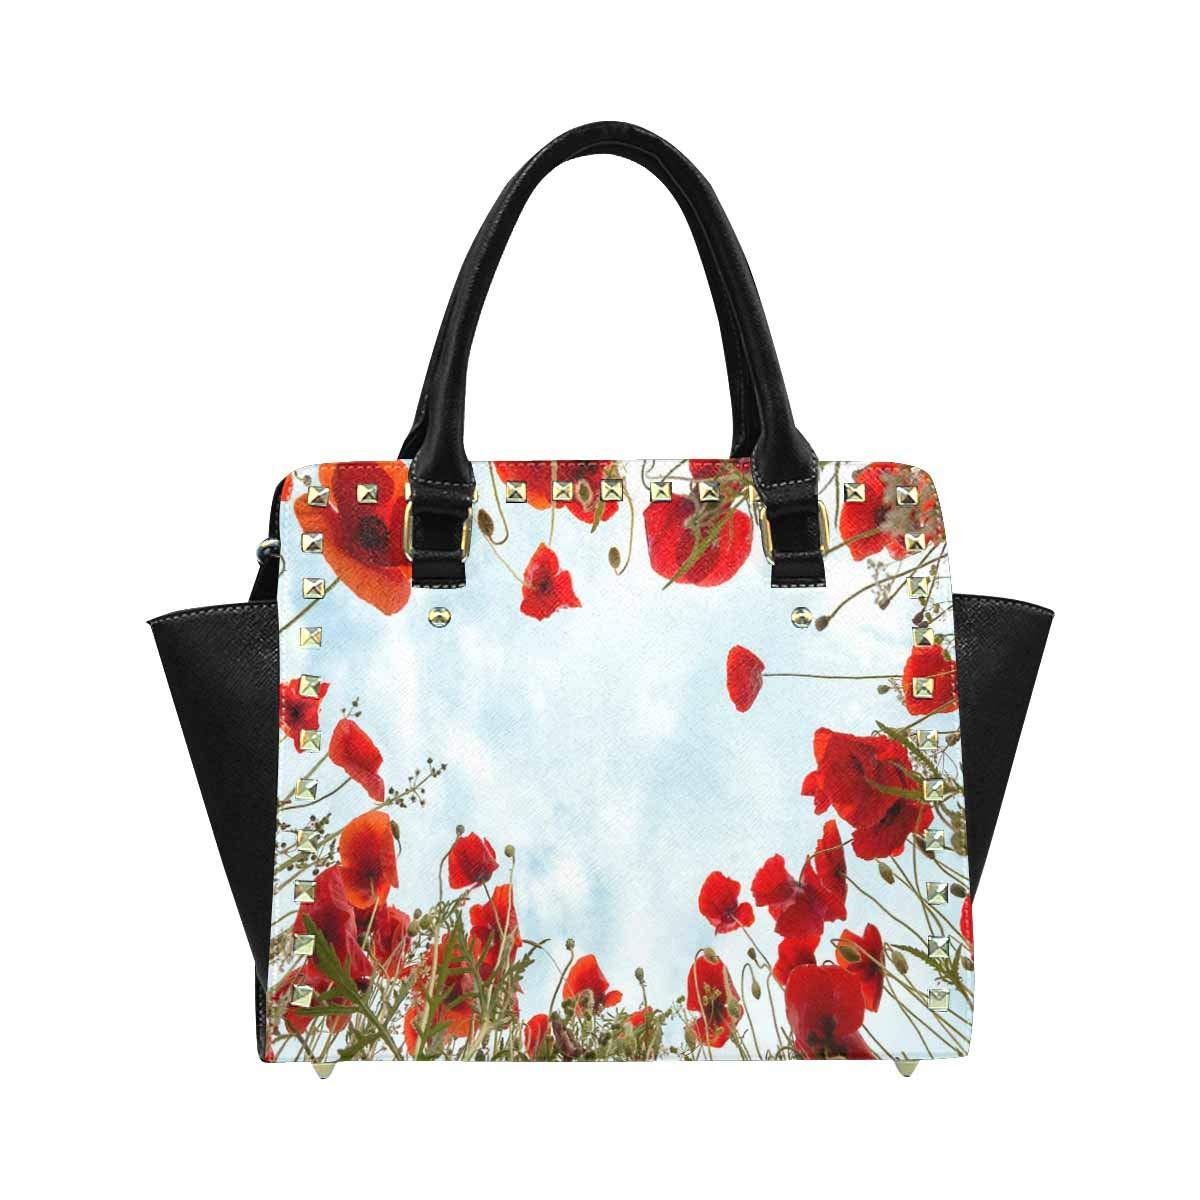 InterestPrint Womens Brown Paw Print with Hearts Rivet Shoulder Handbag Shoulder Bags